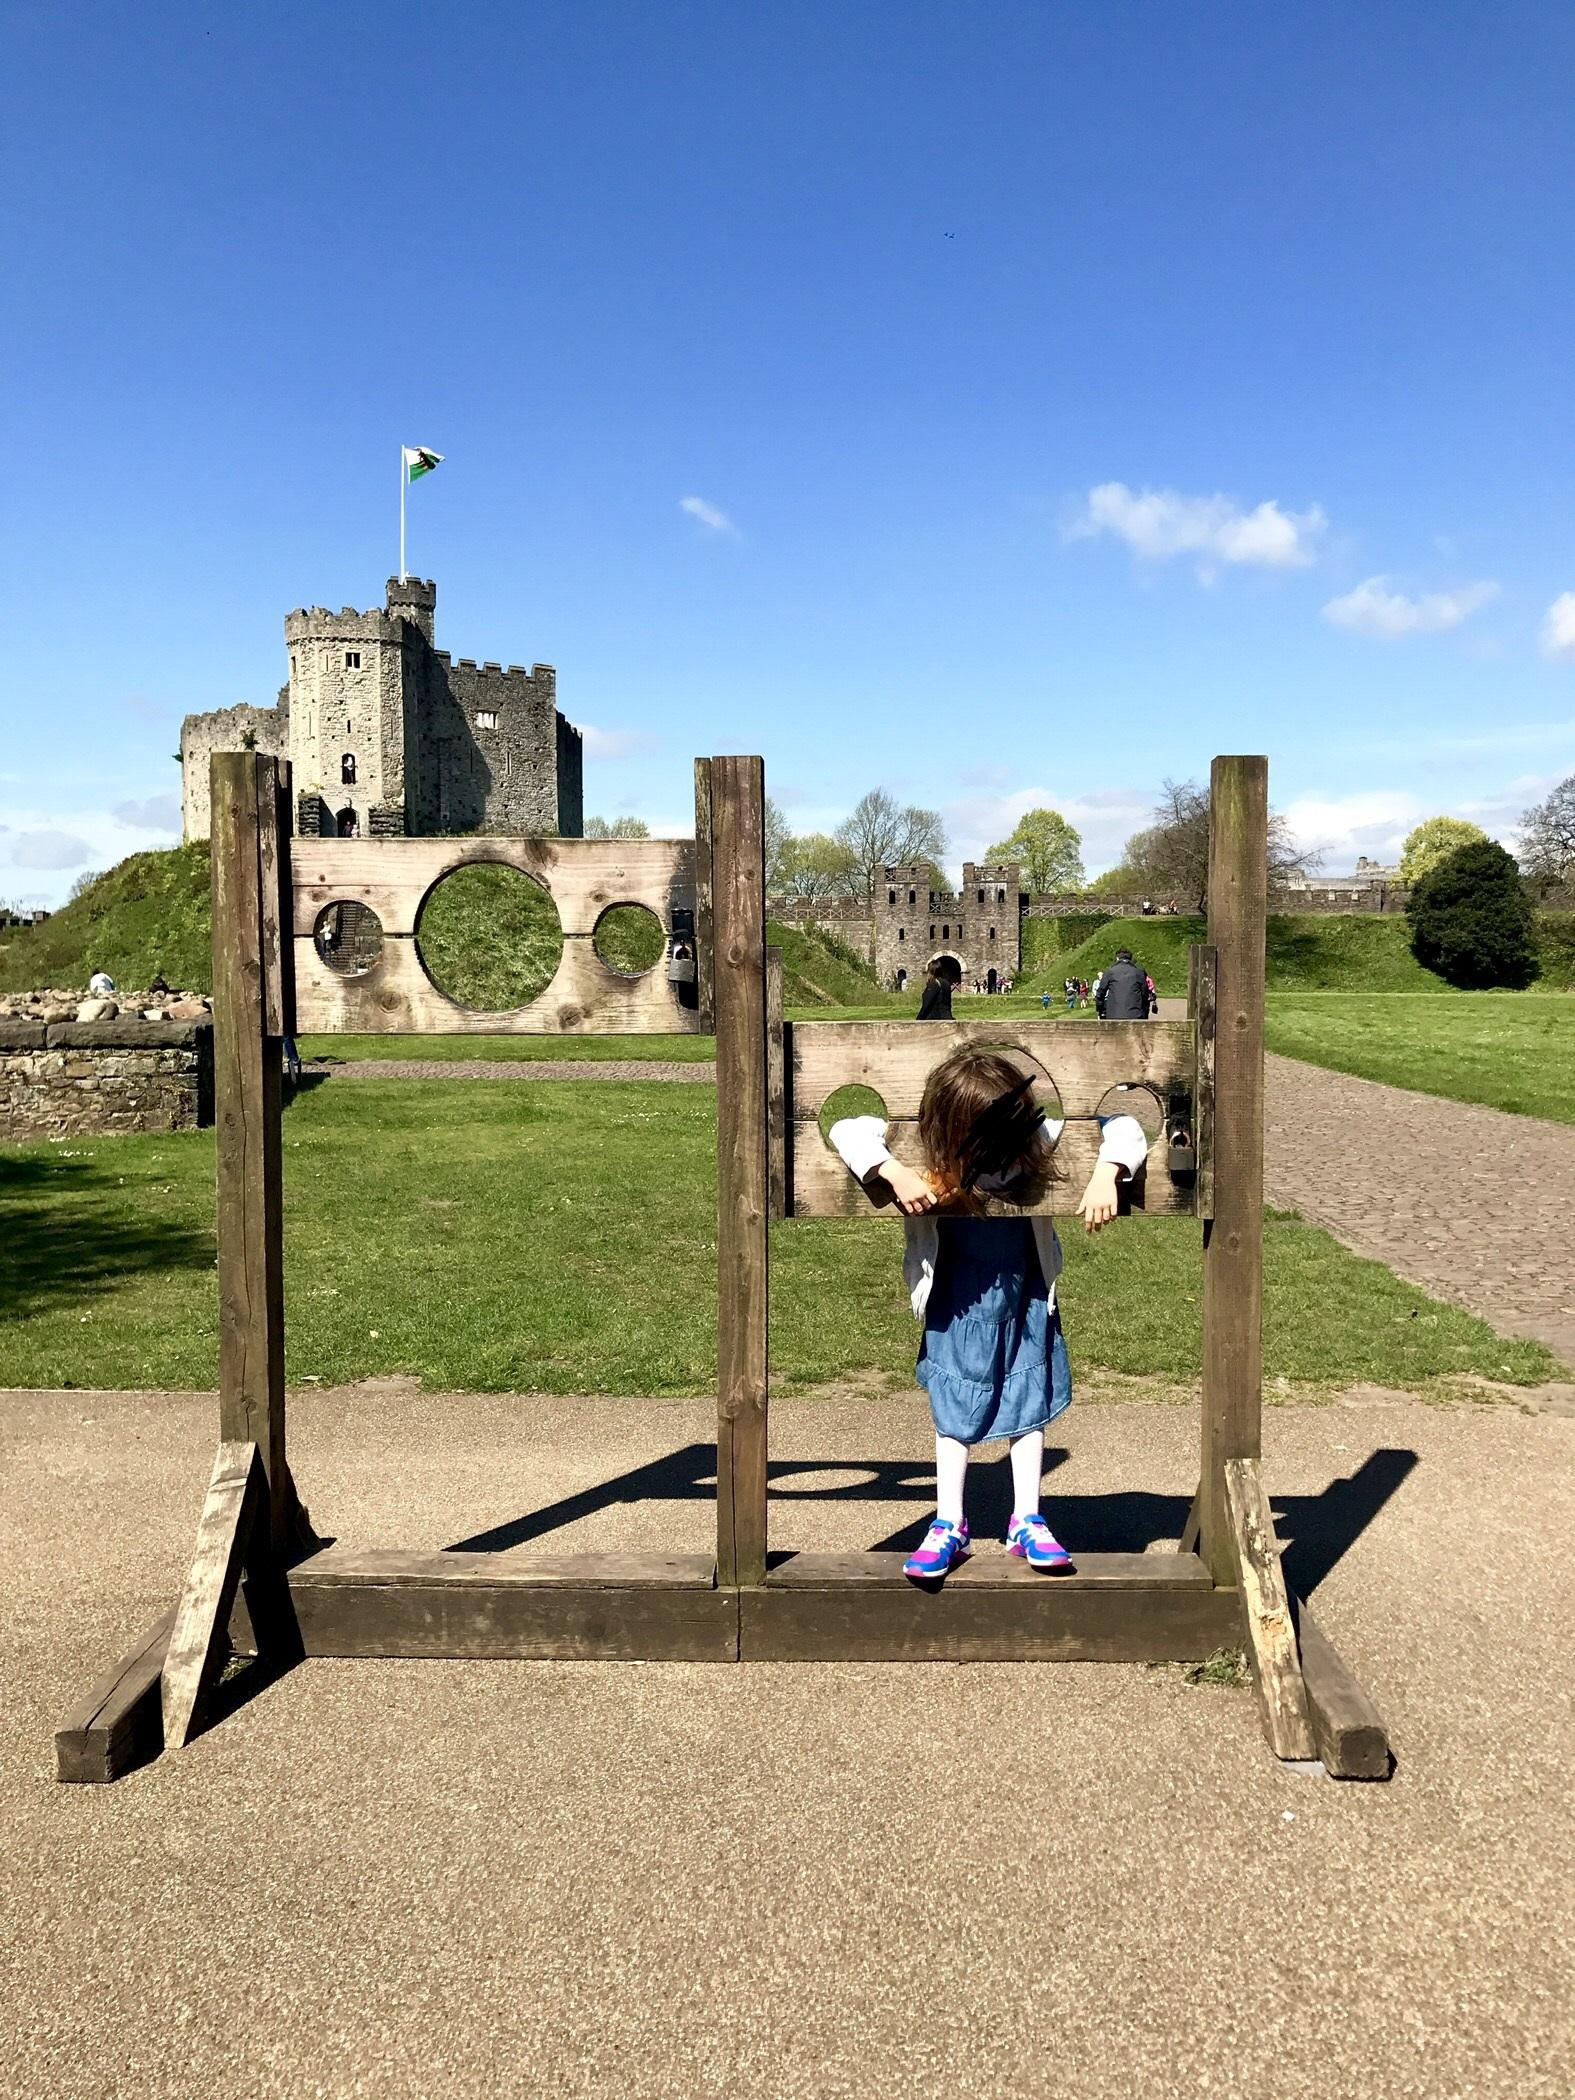 Cardiff Castle stocks